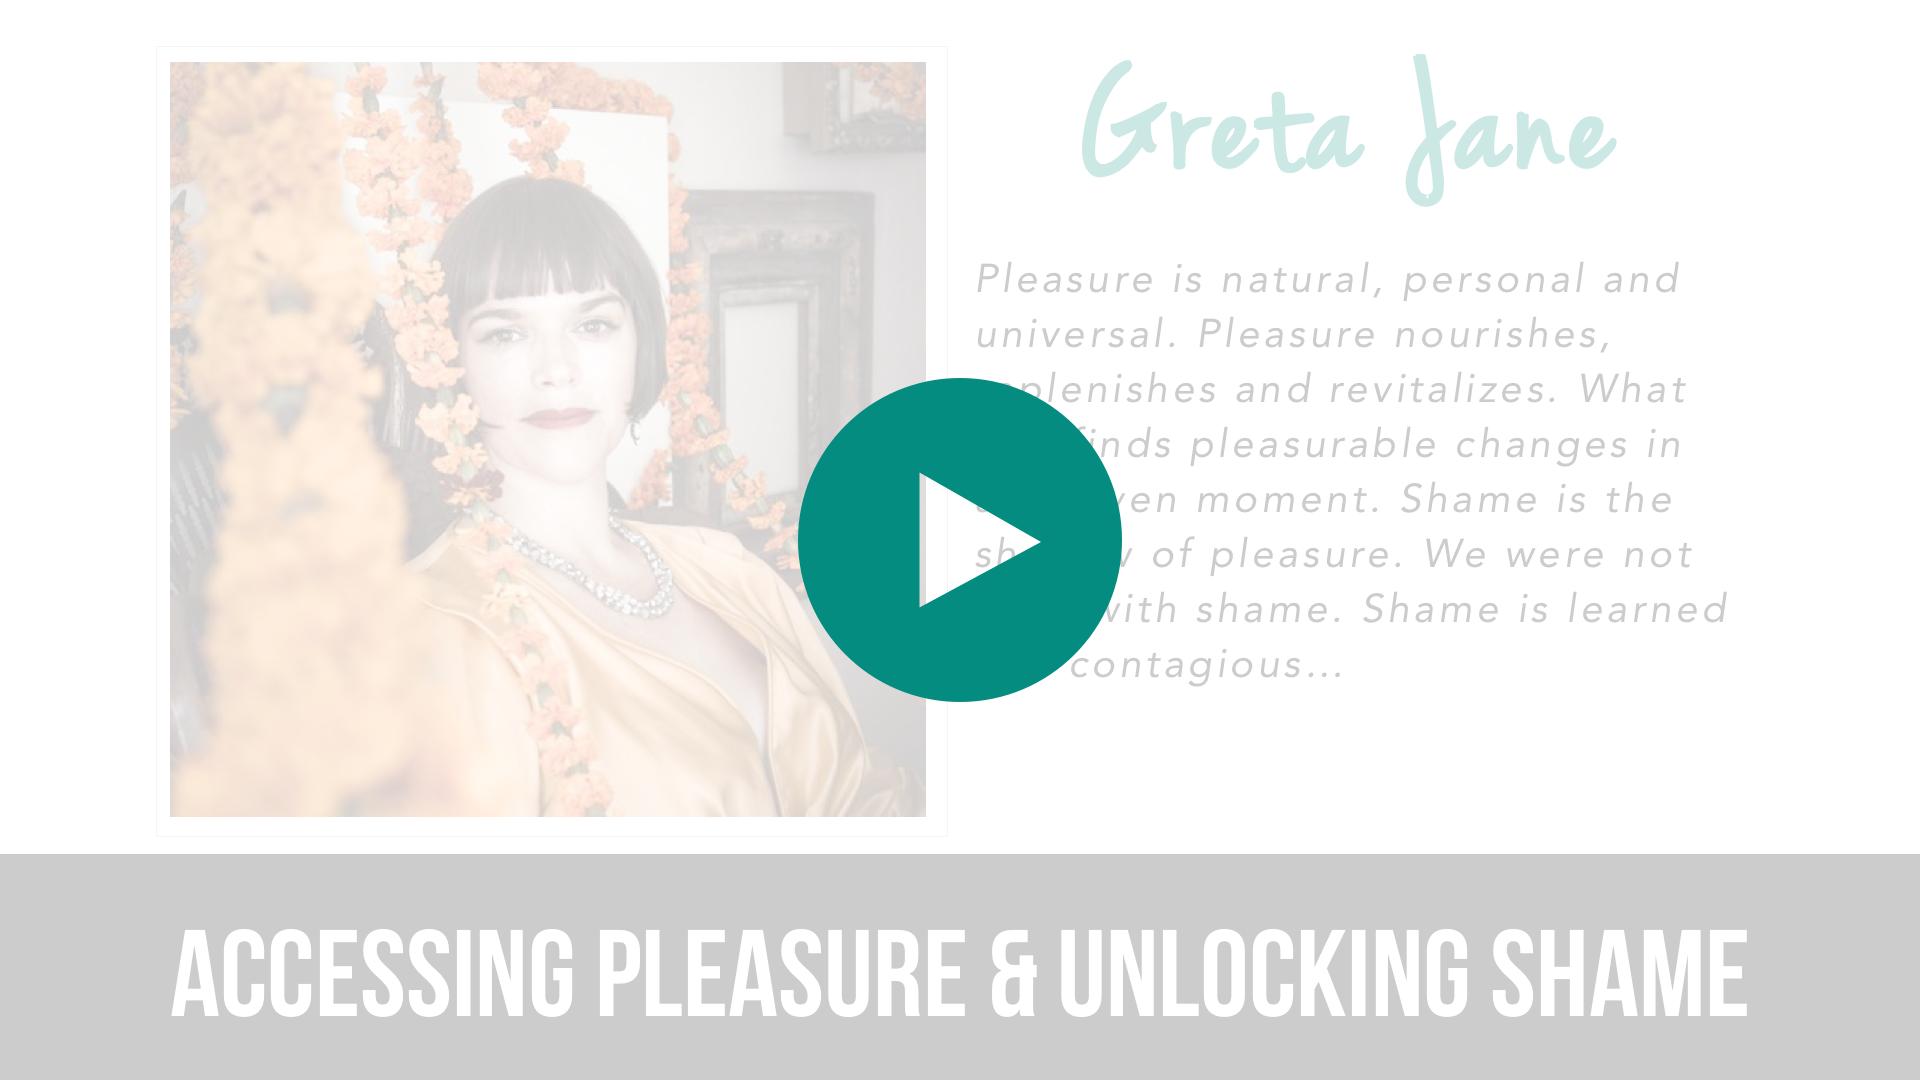 Accessing Pleasure & Unlocking Shame